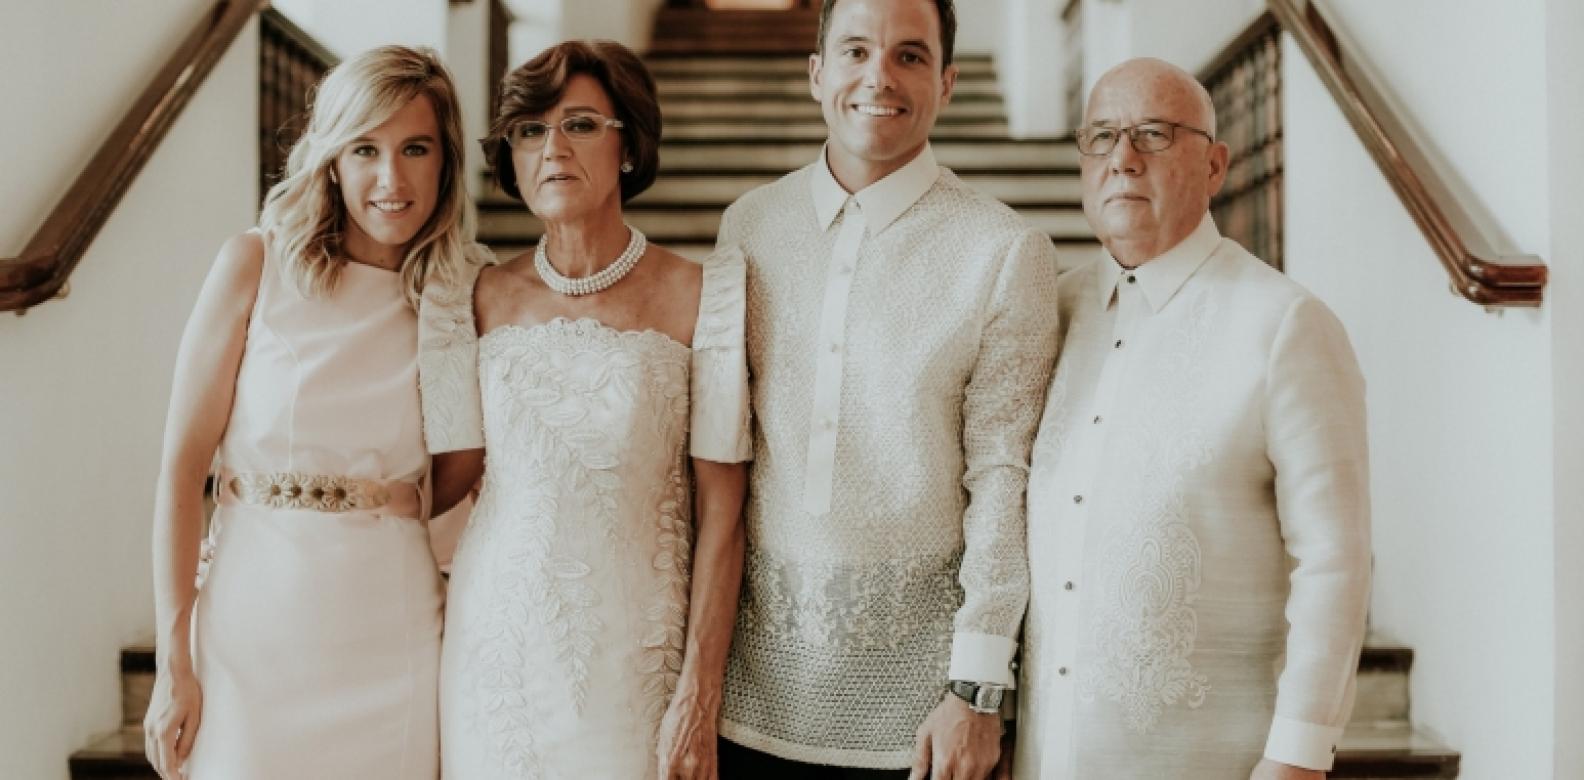 Claudia Aguilar Garcia, Alejandra Garcia Soriano, the groom, and Jose Aguilar Guillén